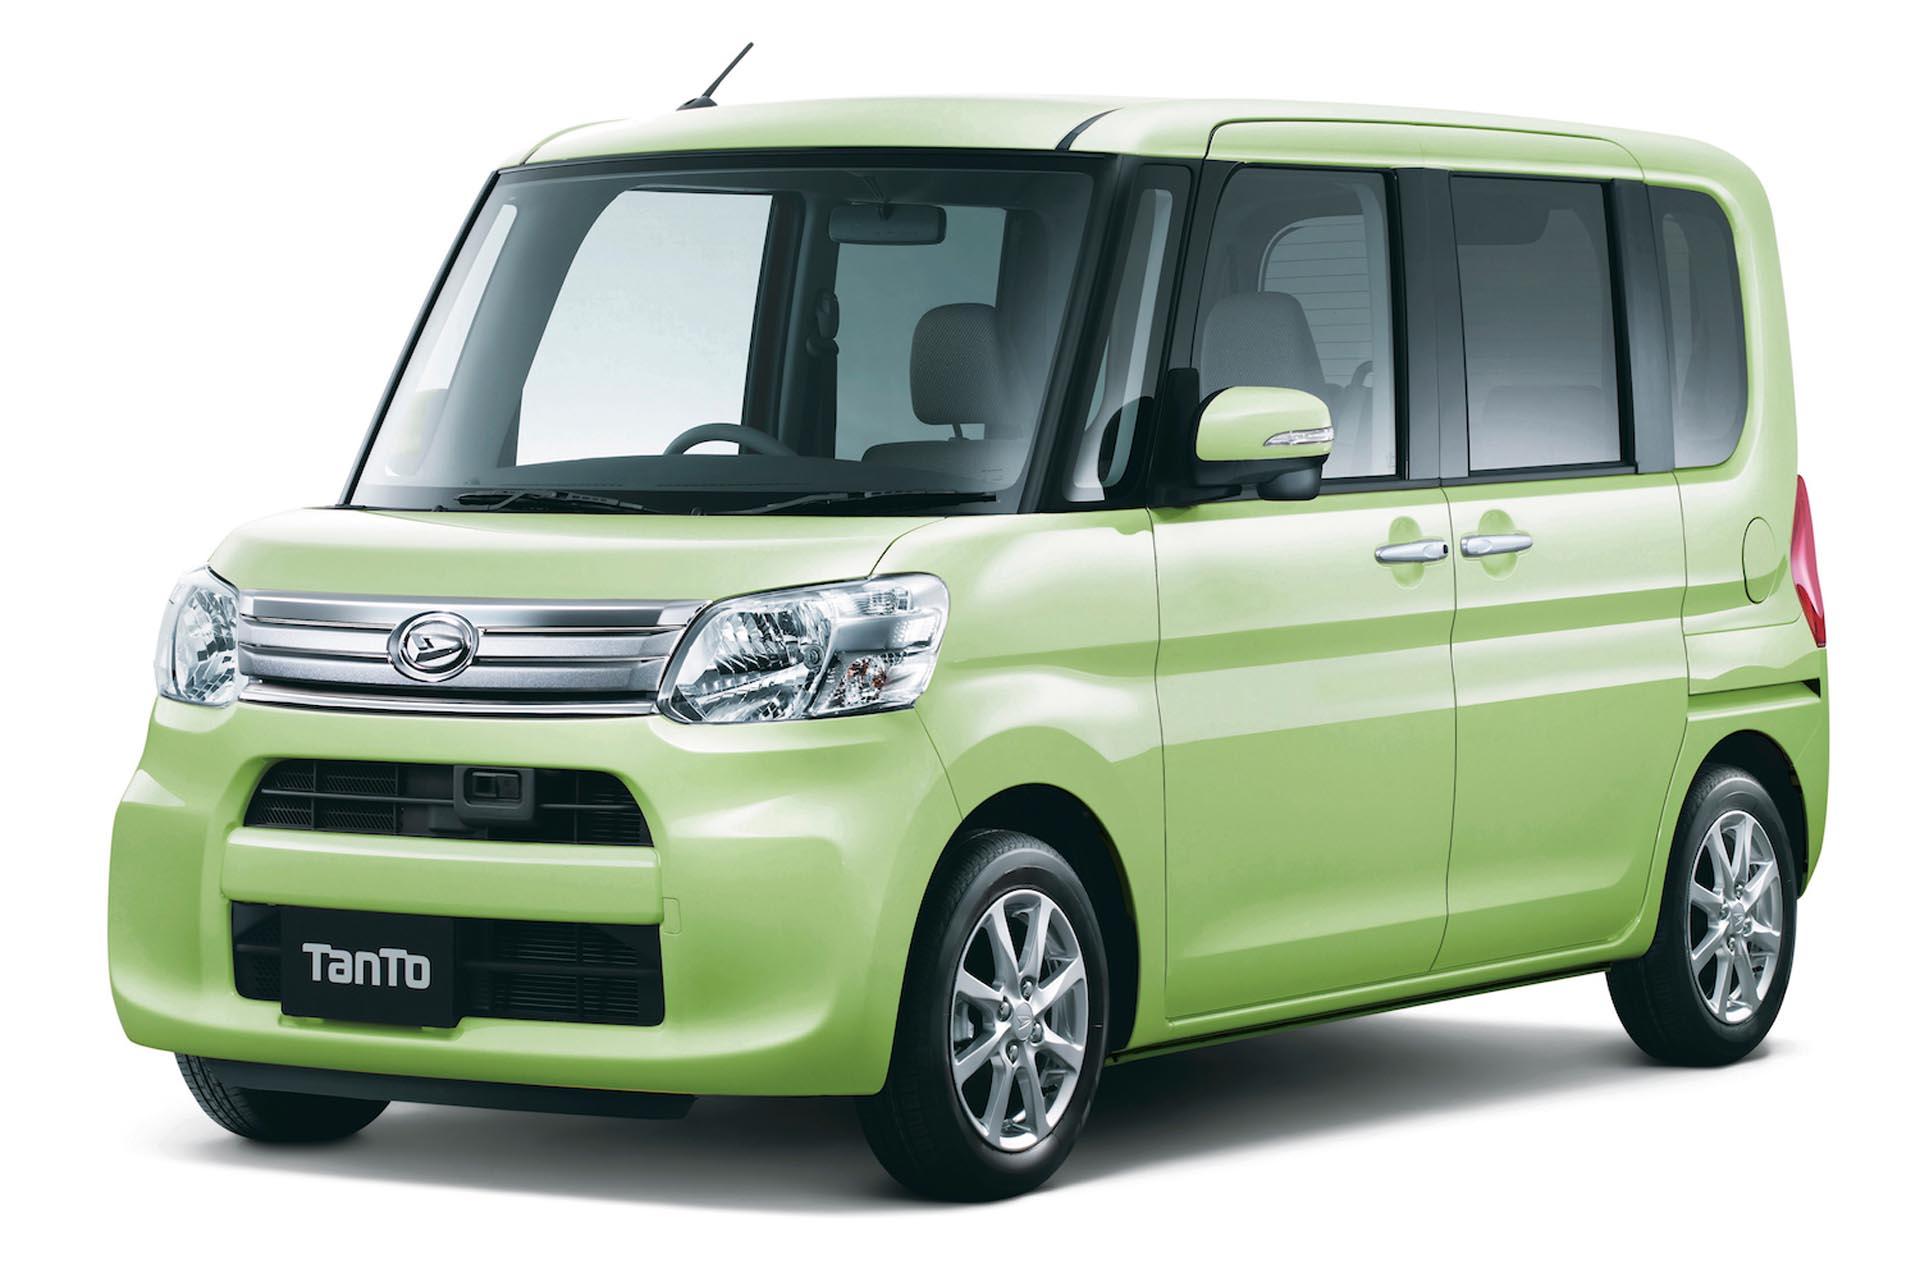 Daihatsu Tanto kei-car ma pudelkowaty ksztalt